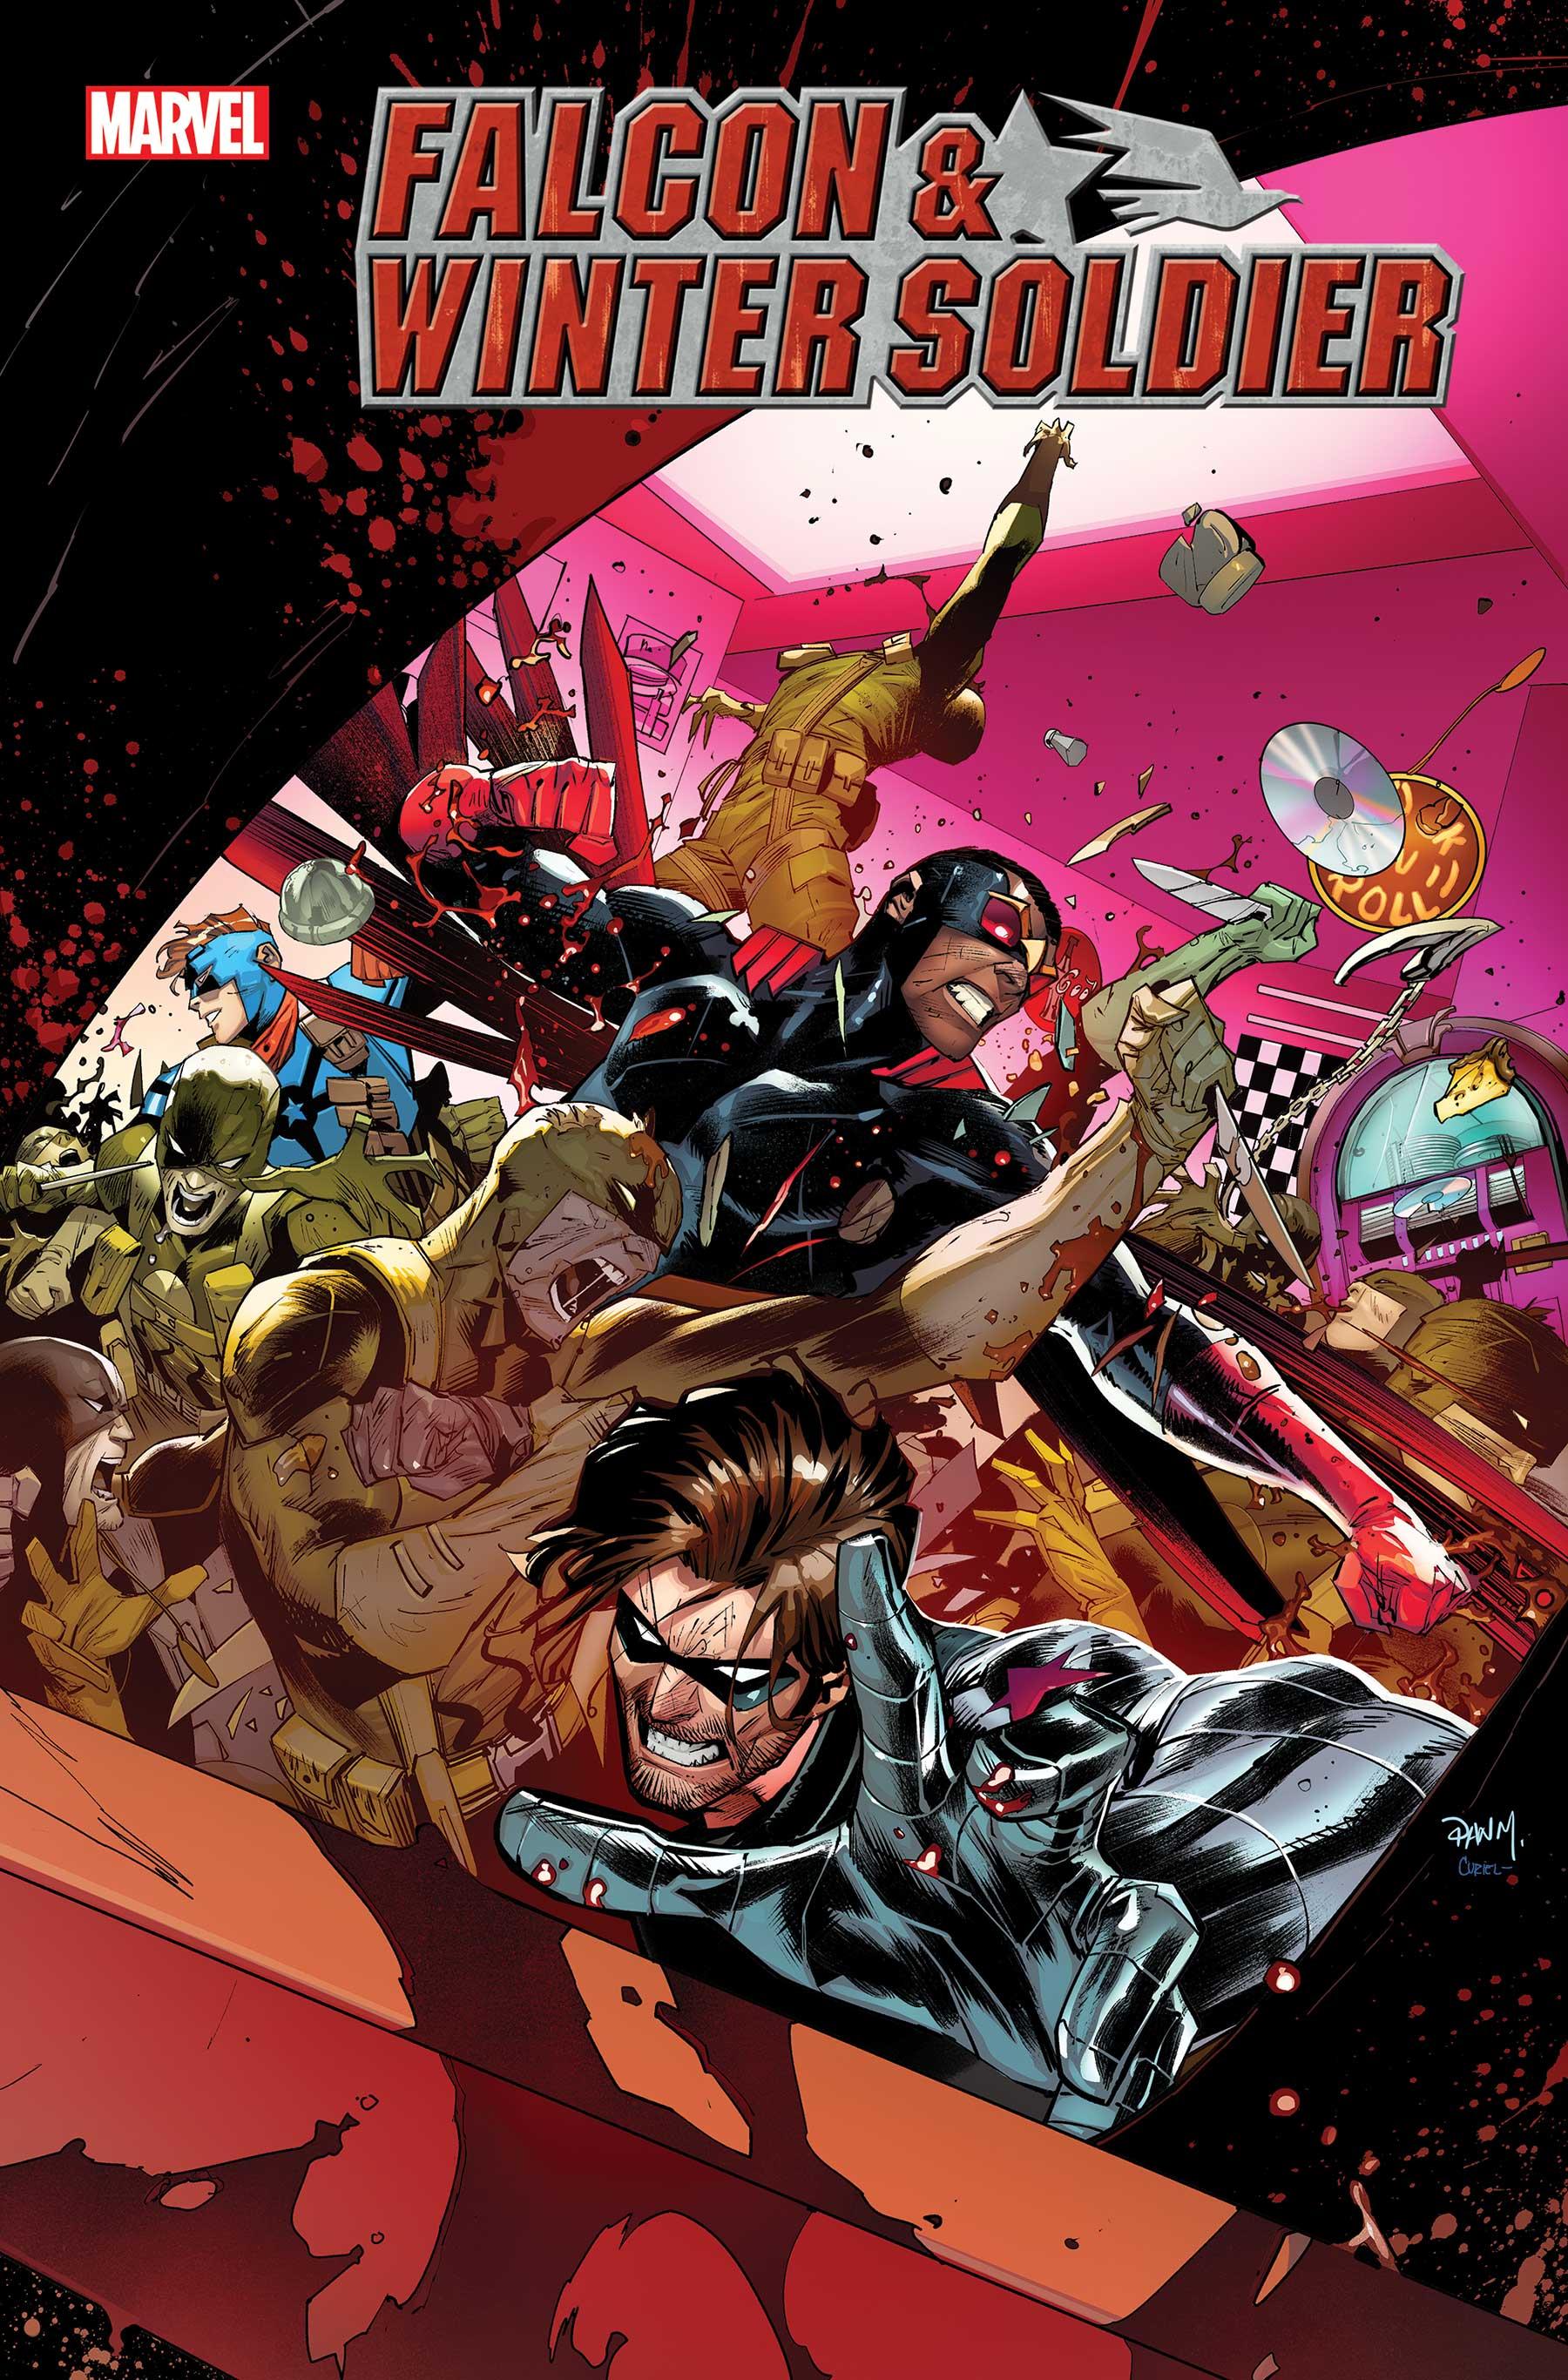 Falcon and Winter Soldier #5 Cover by Daniel Mora